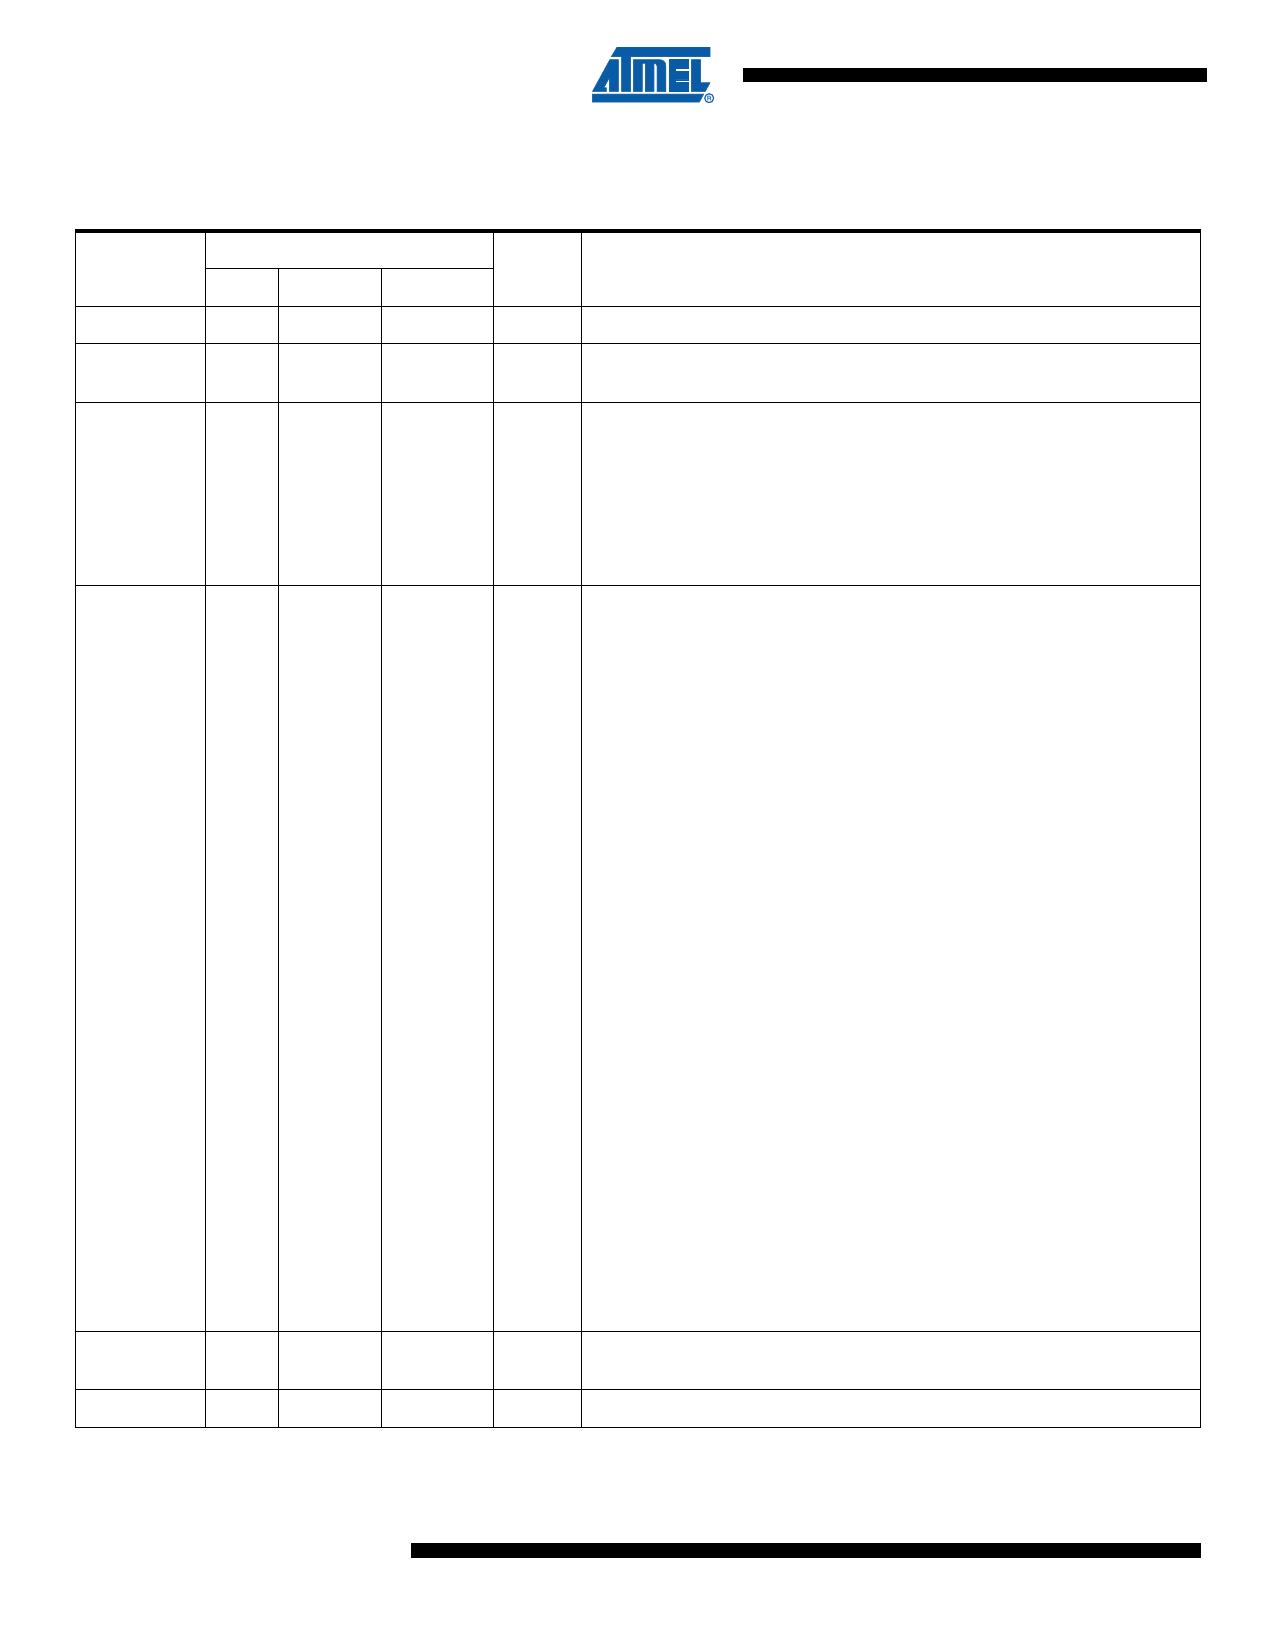 AT80C51RD2 pdf, 반도체, 판매, 대치품